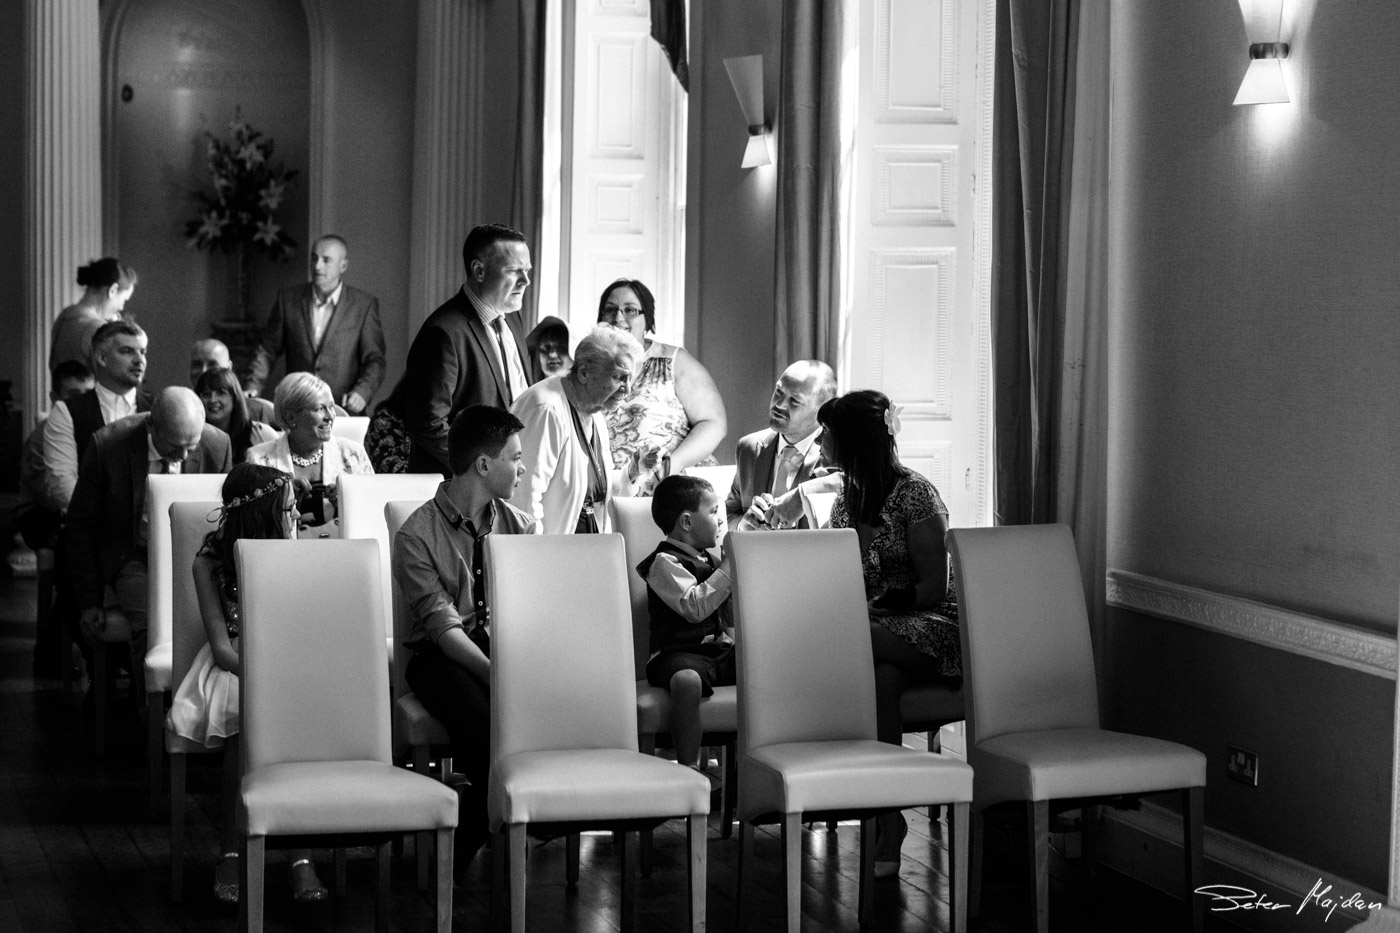 Colwick-hall-wedding-photography-13.jpg